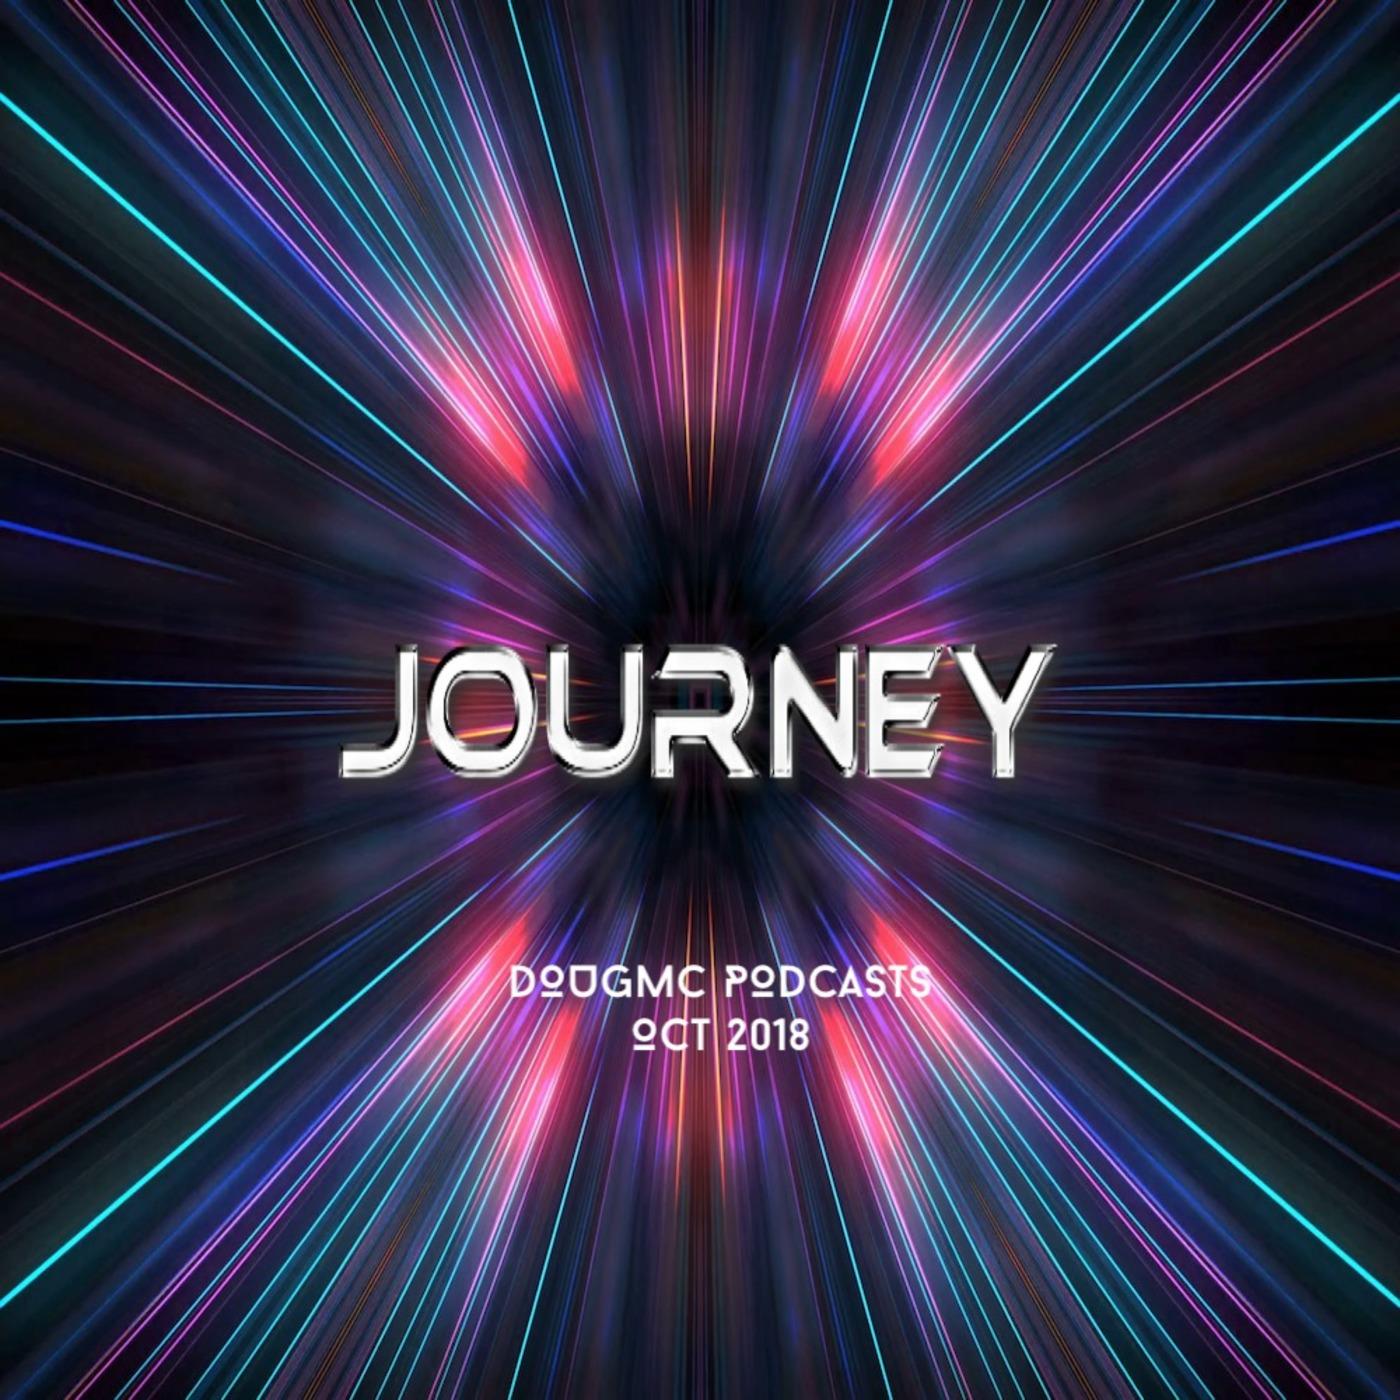 JOURNEY - Uplifting Trance Mix By Dougmc DJ Dougmc Podcasts